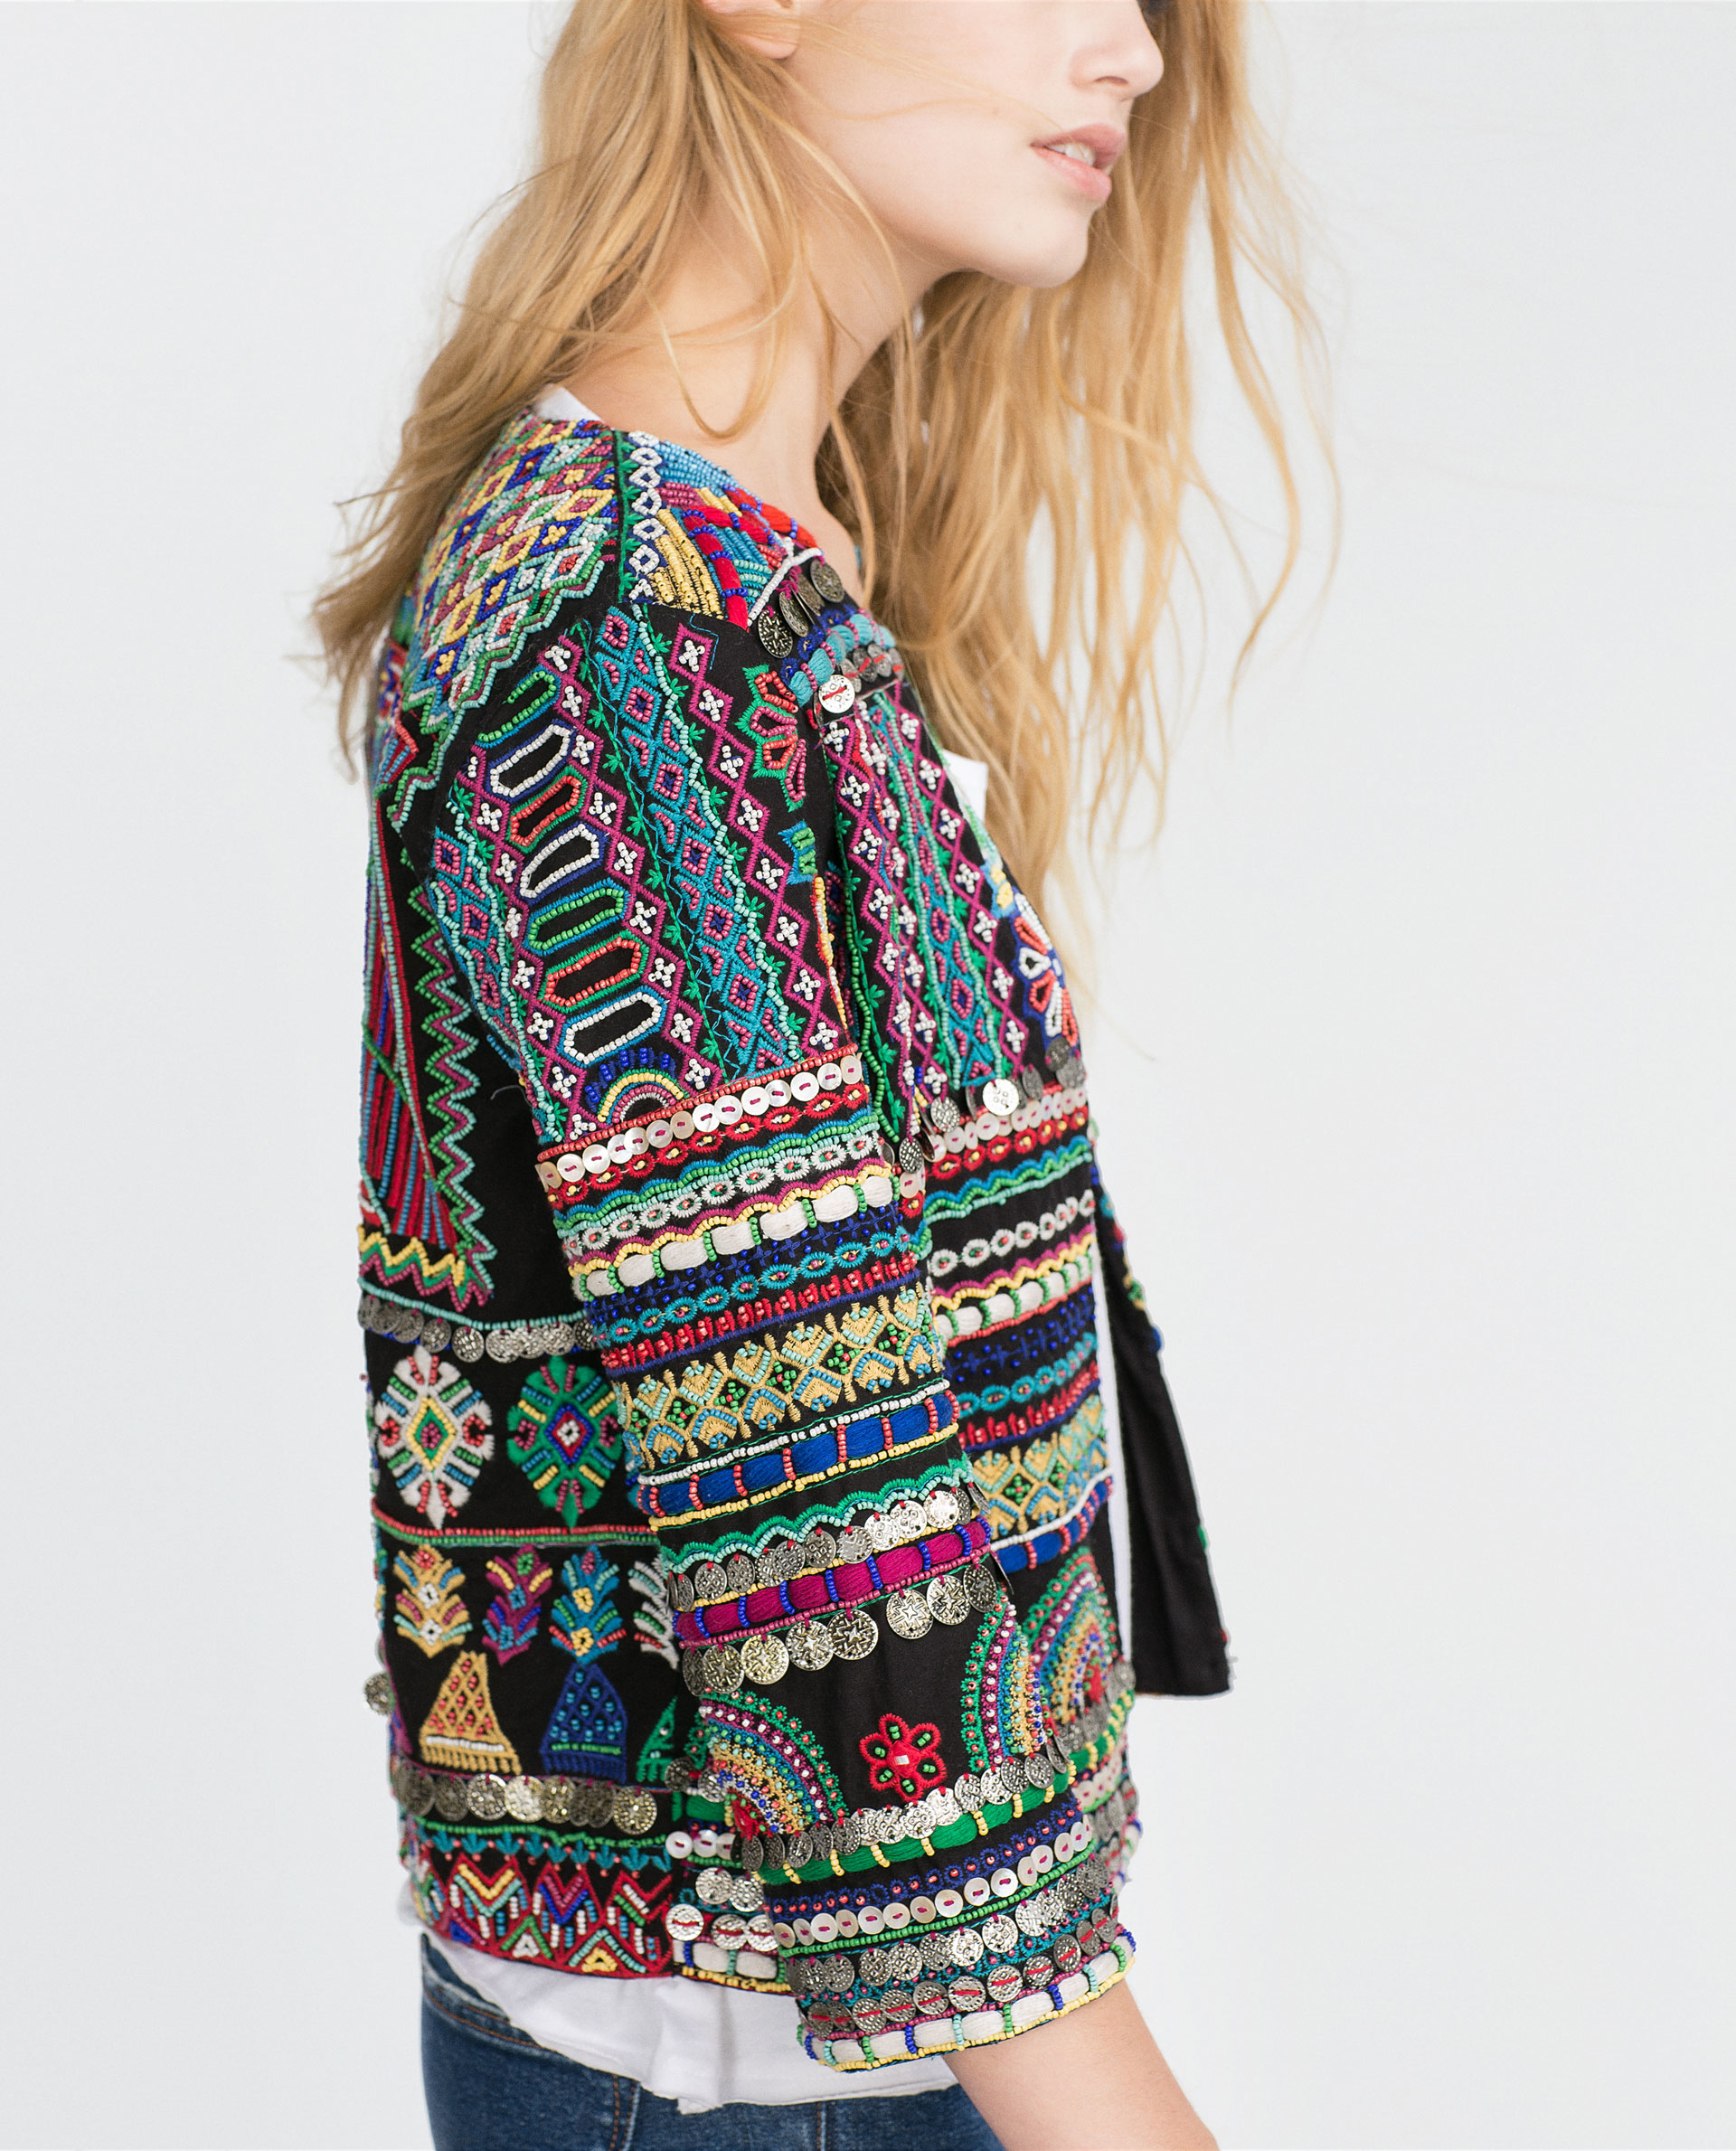 Zara Embroidered Jacket In Black | Lyst